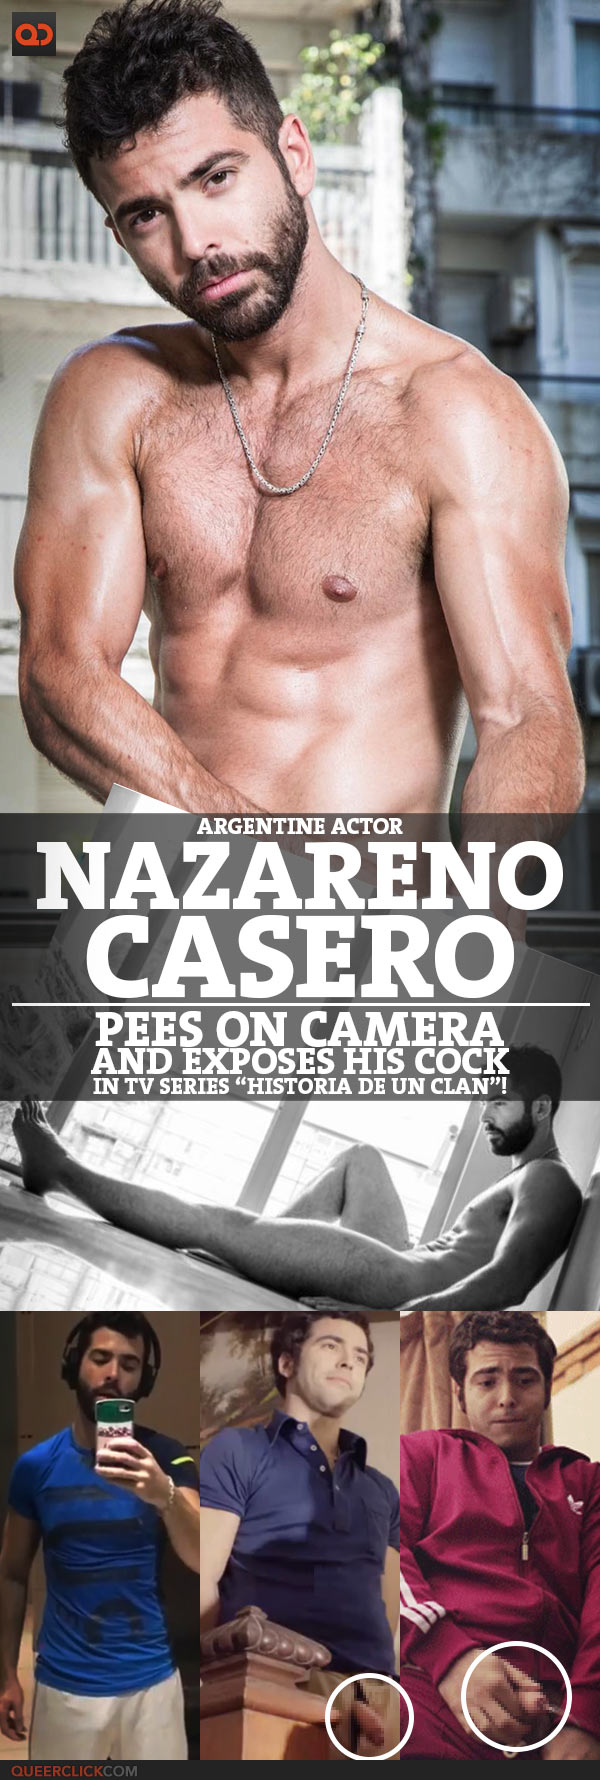 "Nazareno Casero, Argentine Actor, Pees On Camera And Exposes His Cock In Tv Series ""Historia De Un Clan""!"